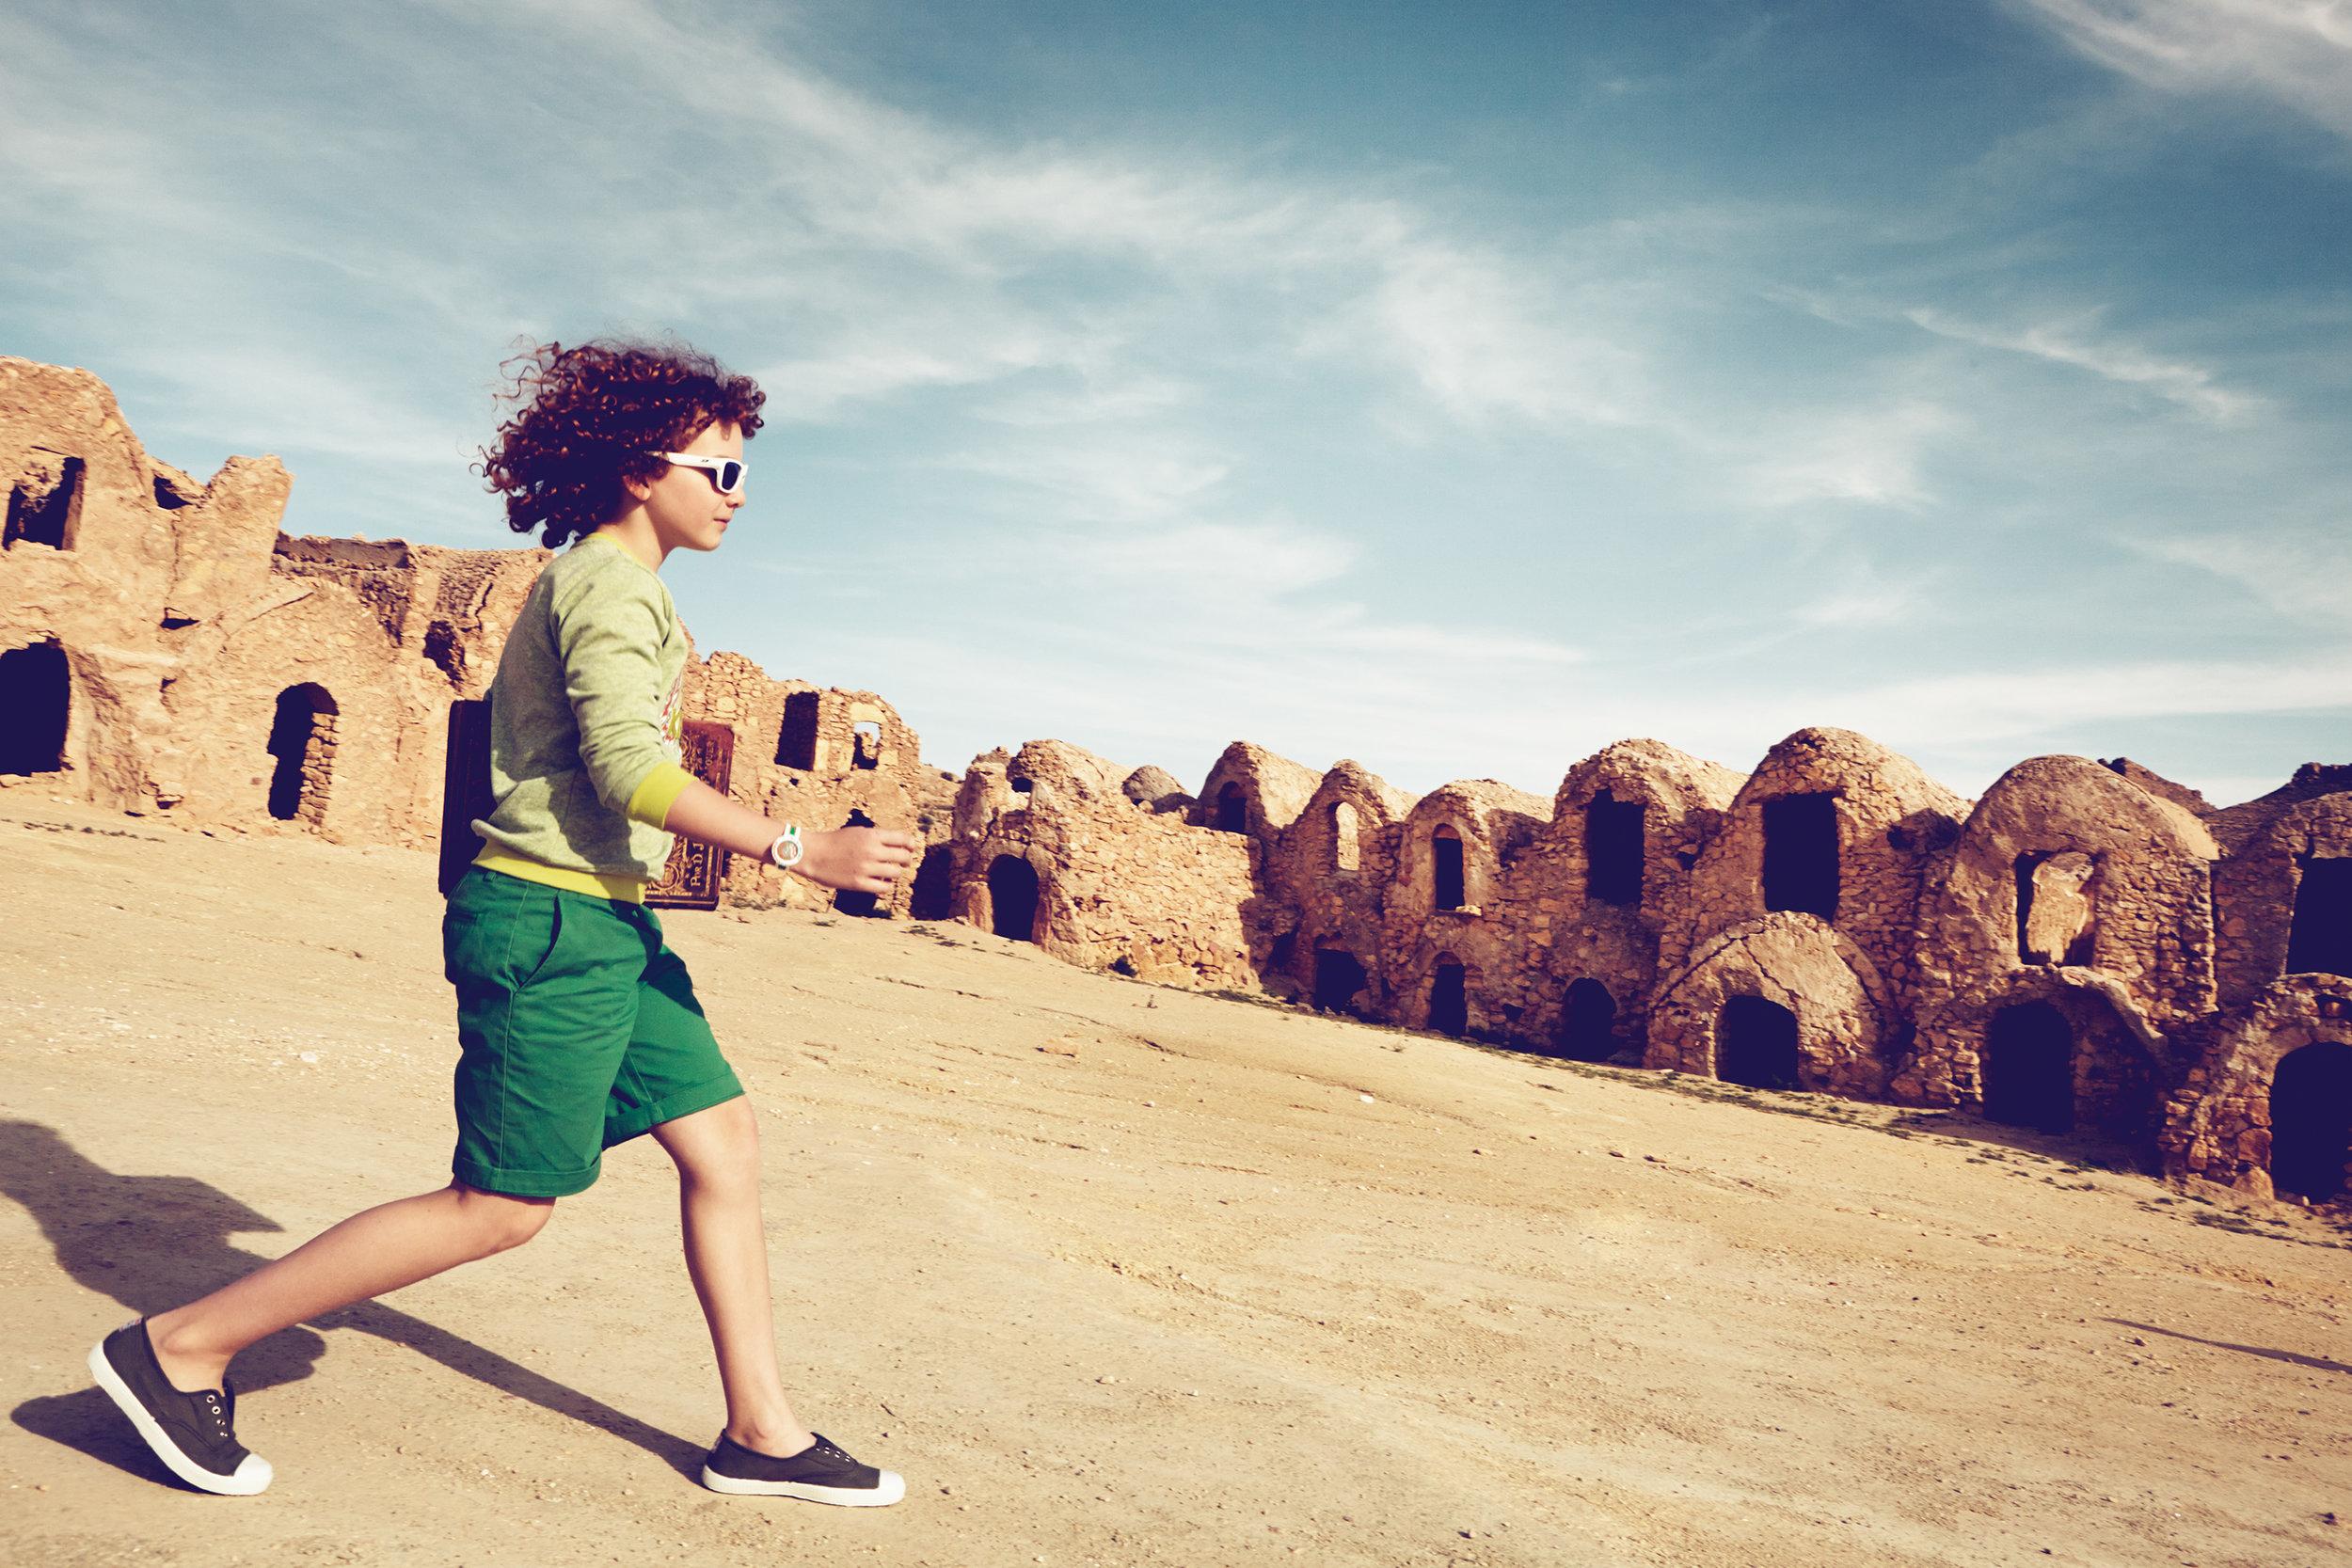 Ilve Little boy running in green shorts